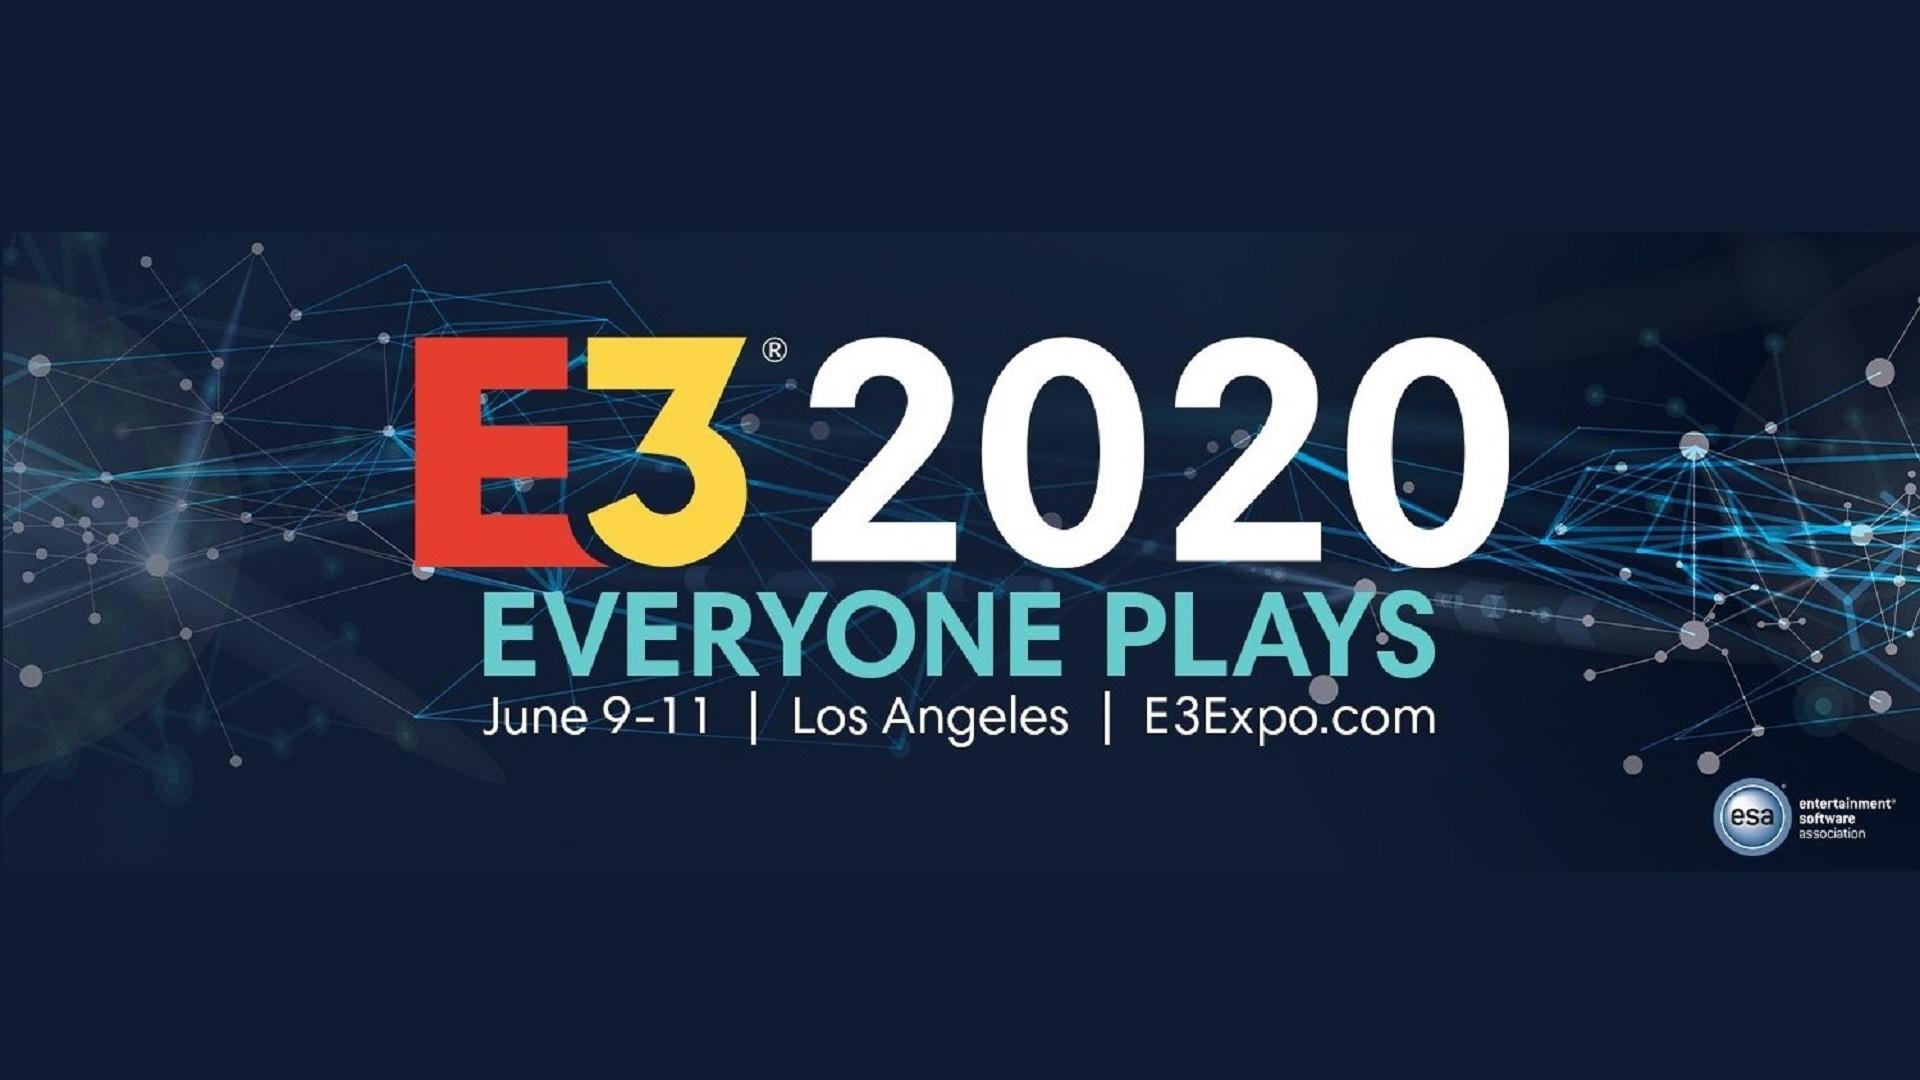 E3 schedule 2020 logo